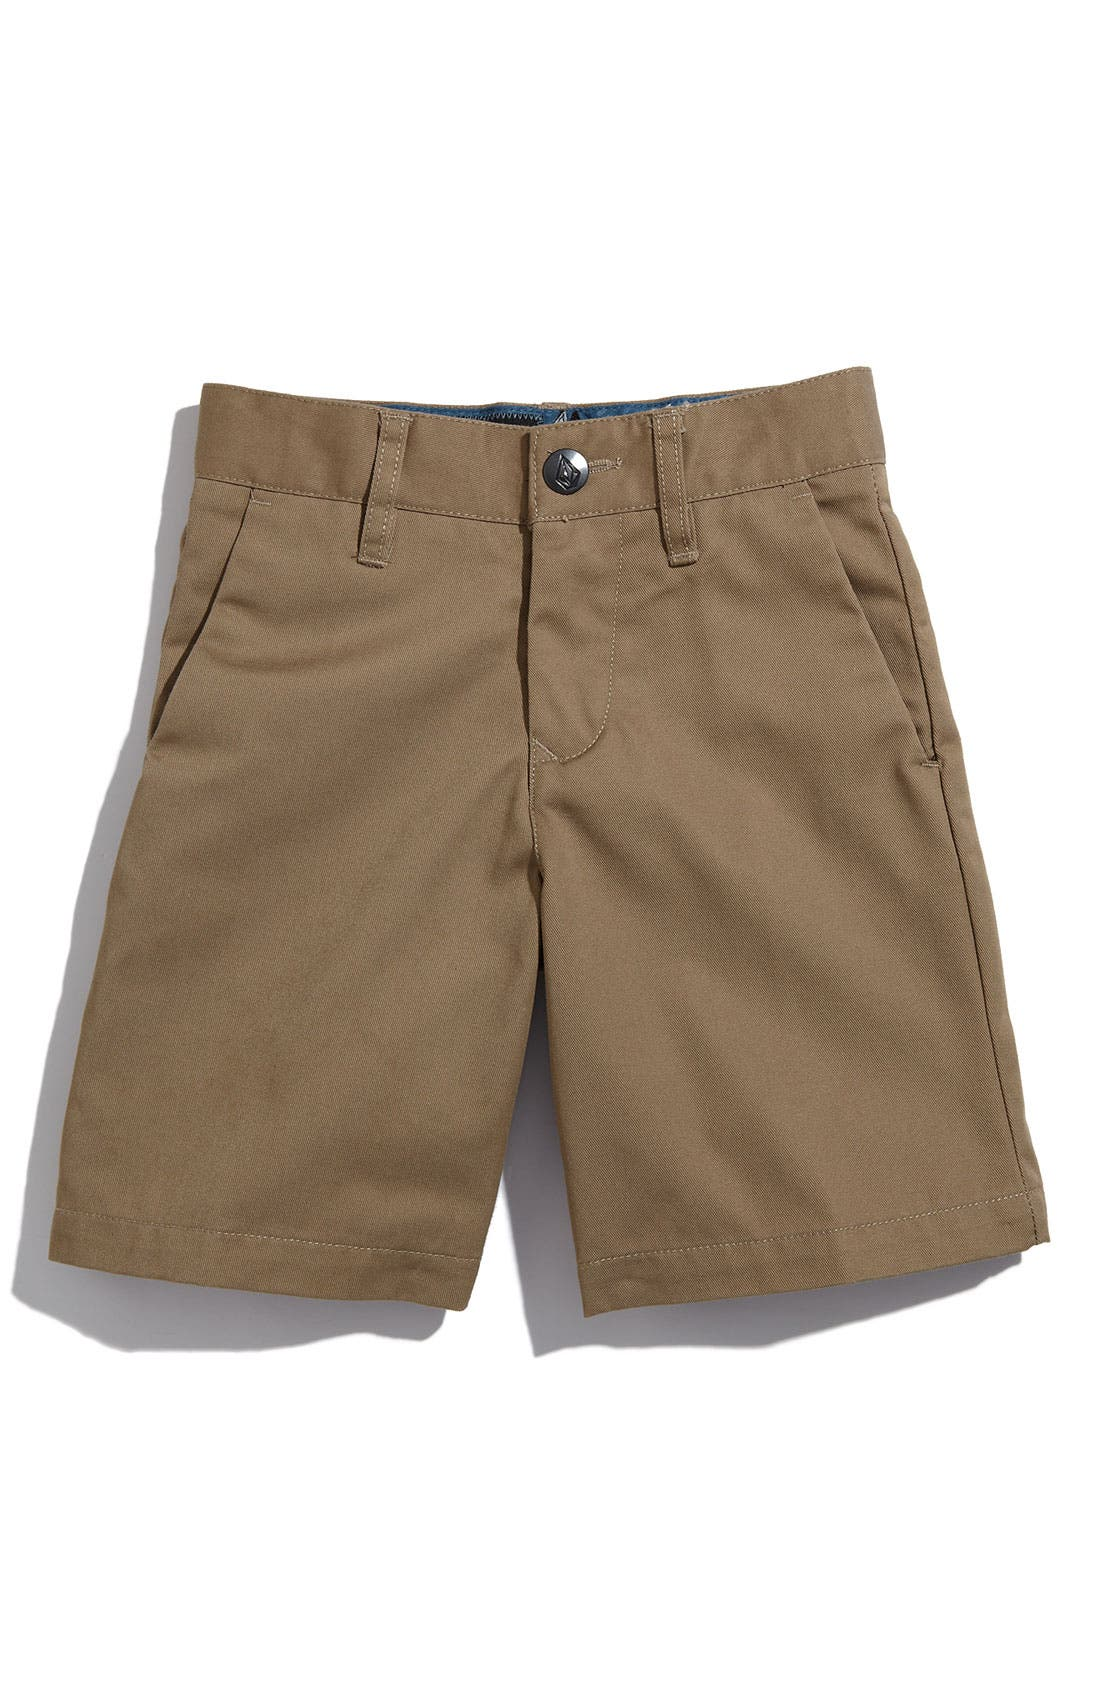 Alternate Image 1 Selected - Volcom 'Modern' Chino Shorts (Toddler Boys)